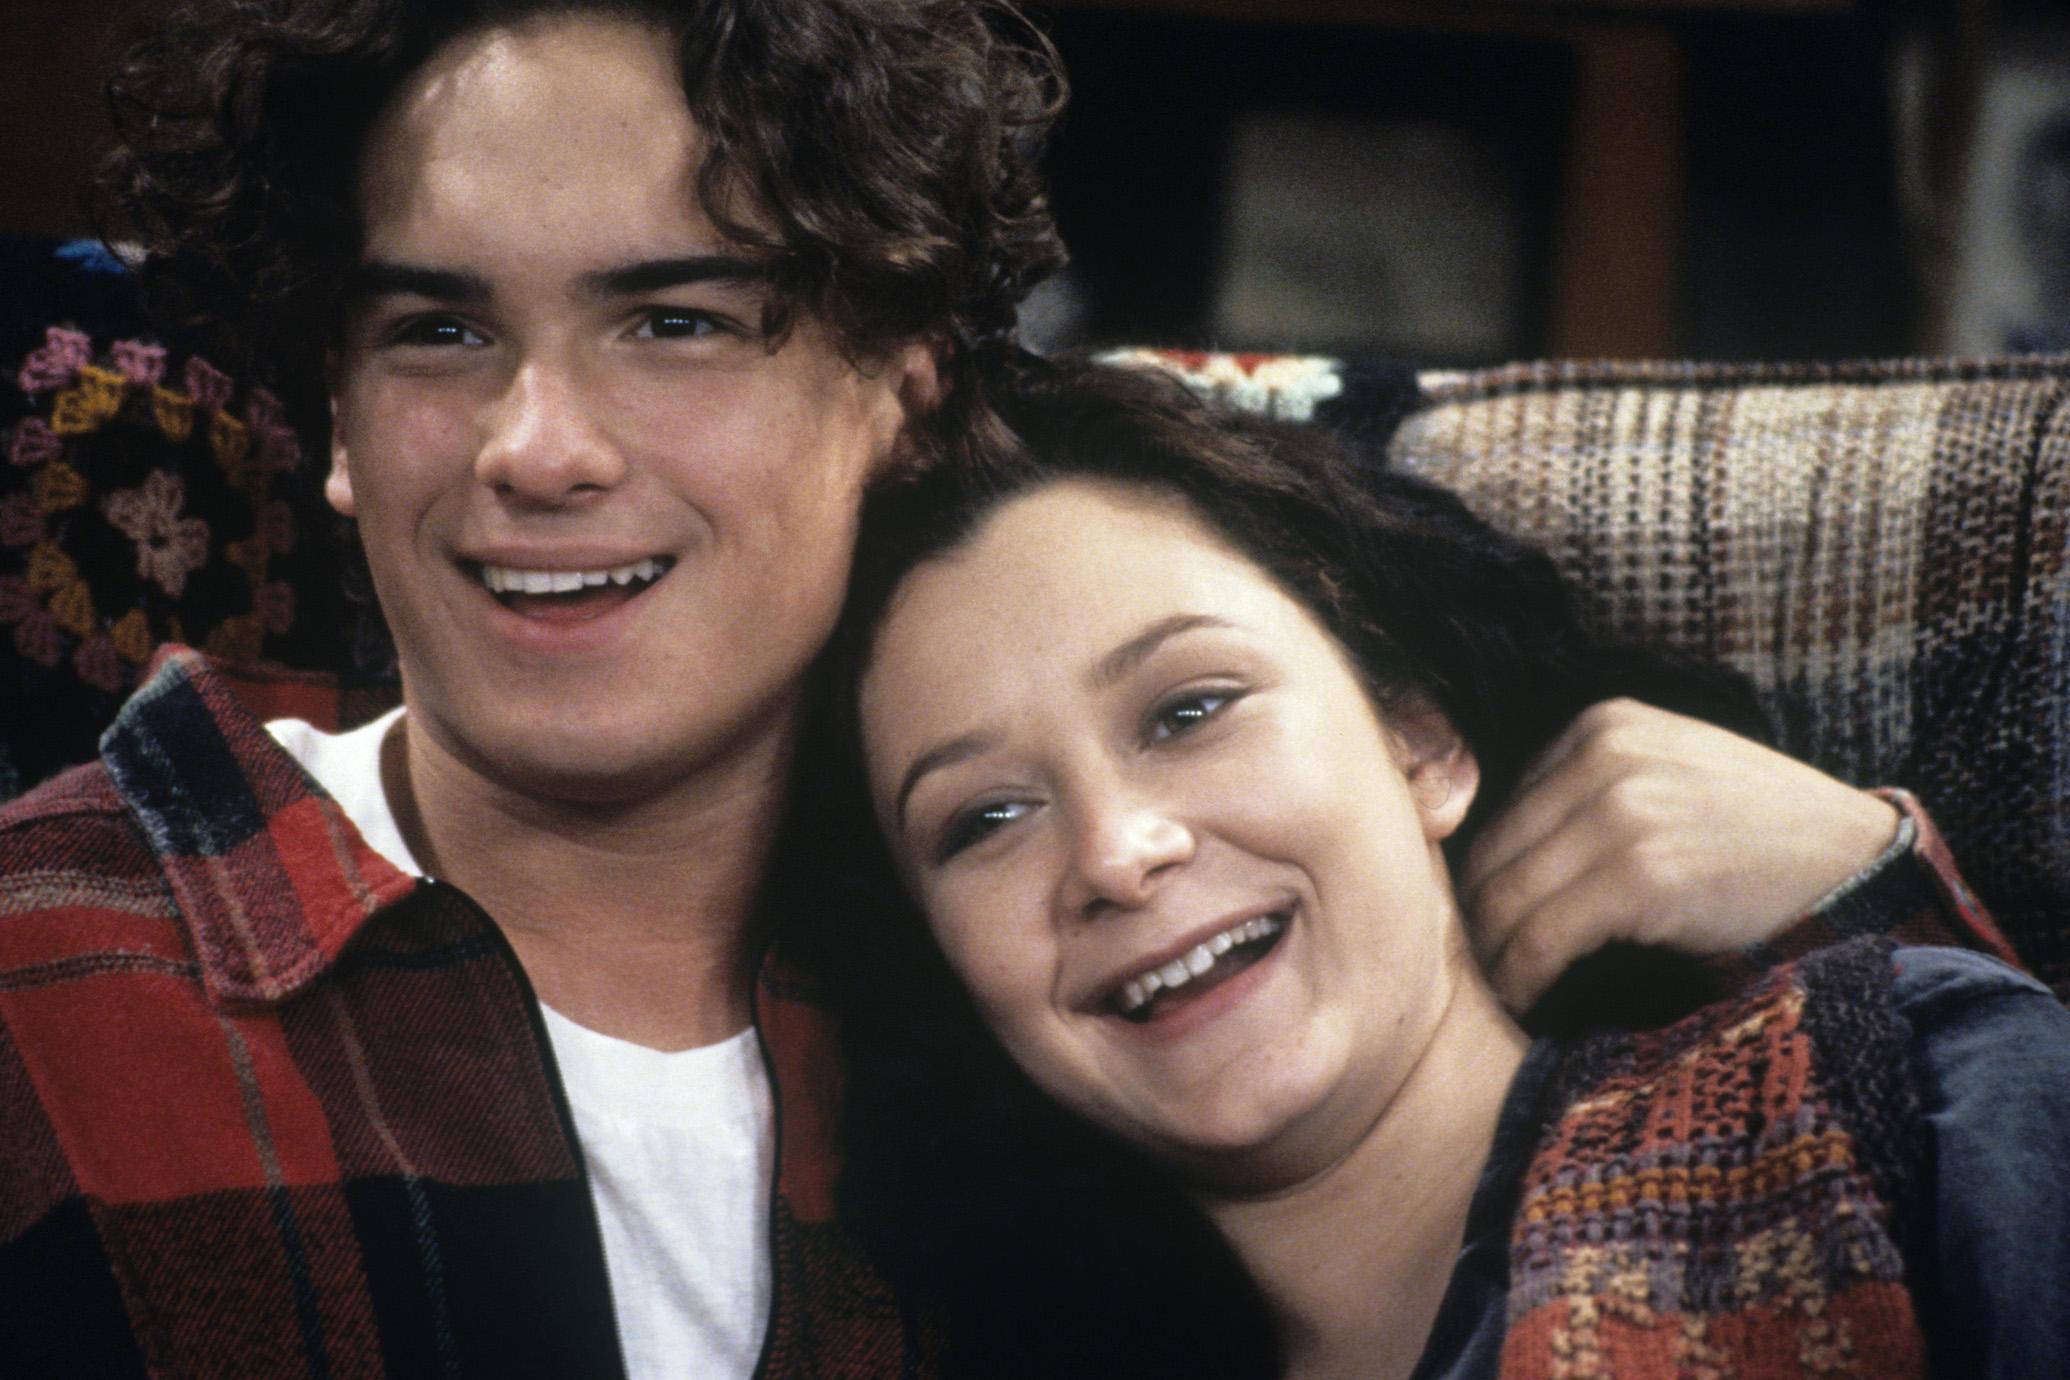 Johnny Galecki as David Healy and Sara Gilbert as Darlene Conner on Roseanne